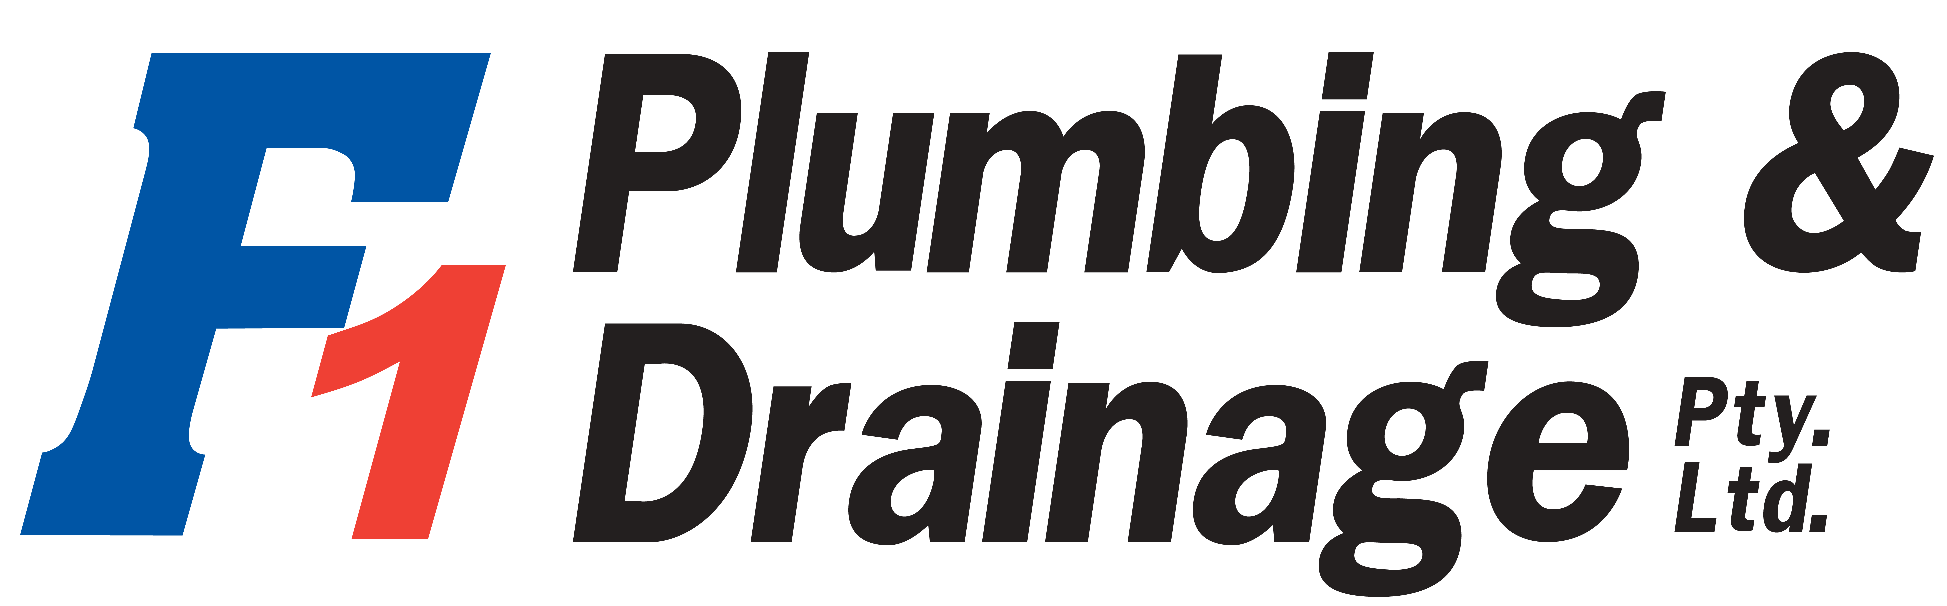 F1plumbing & Drainage Pty Ltd